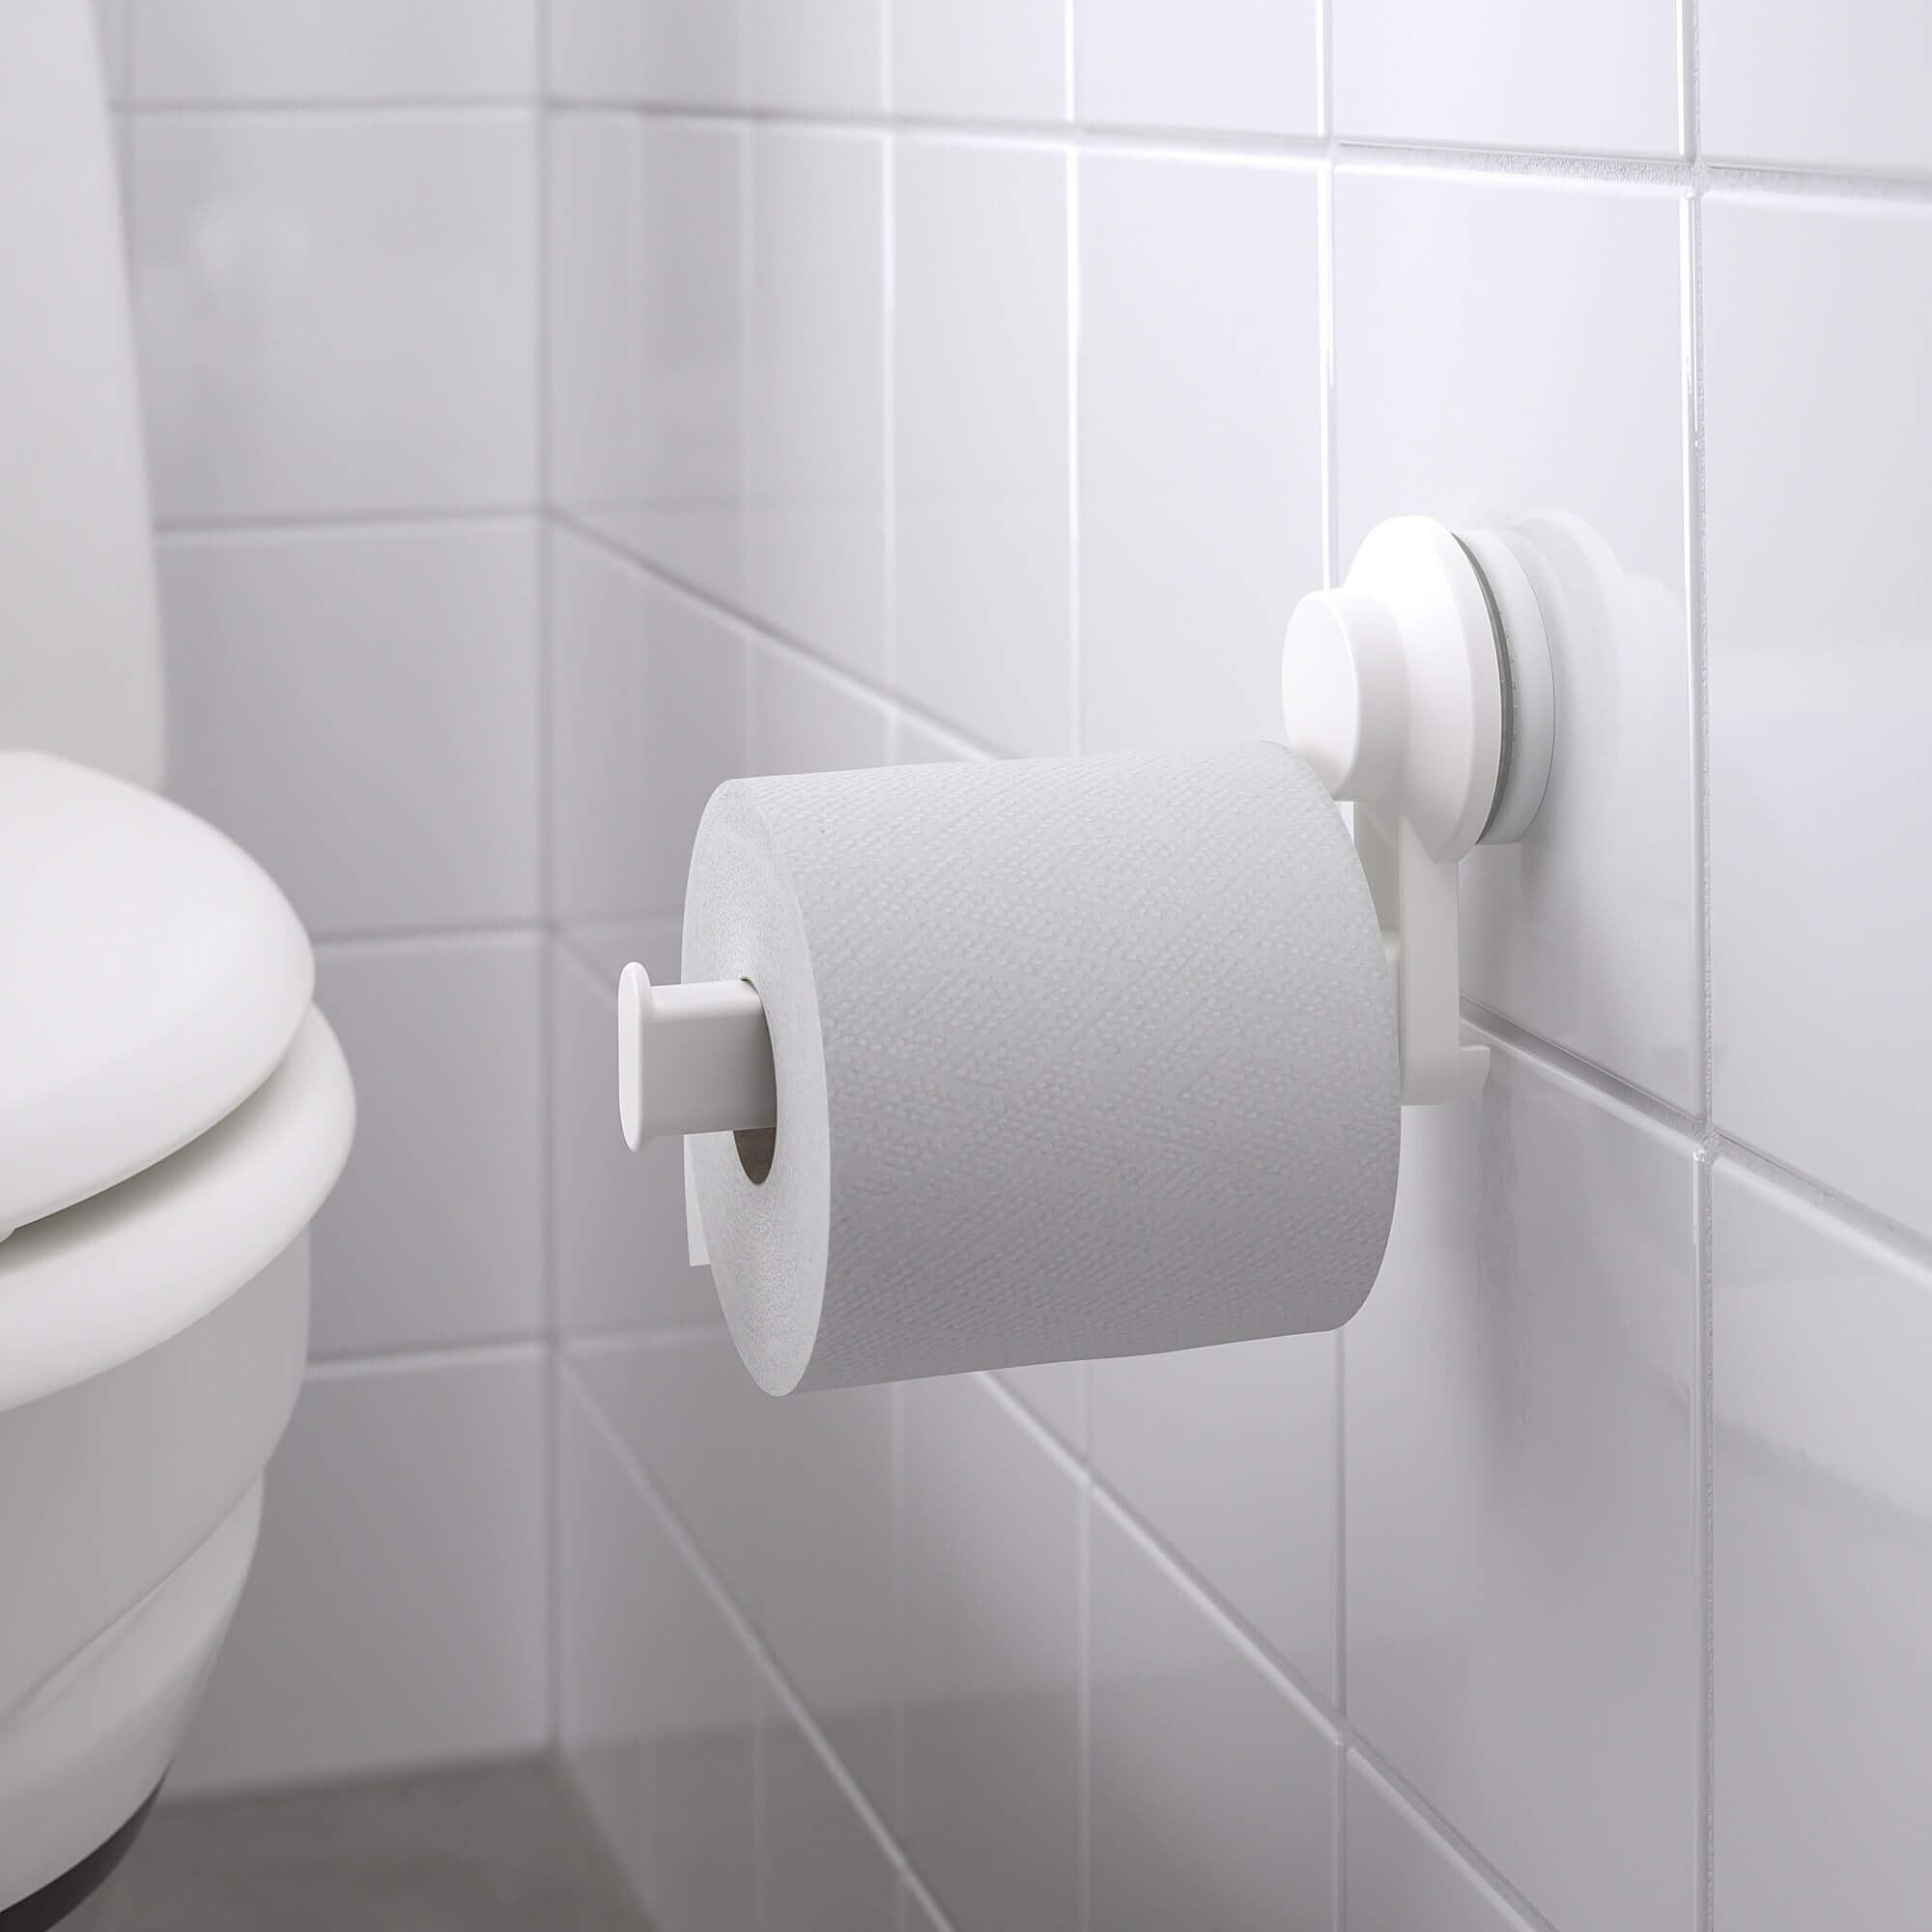 تصویر جا دستمال توالت ایکیا مدل TISKEN